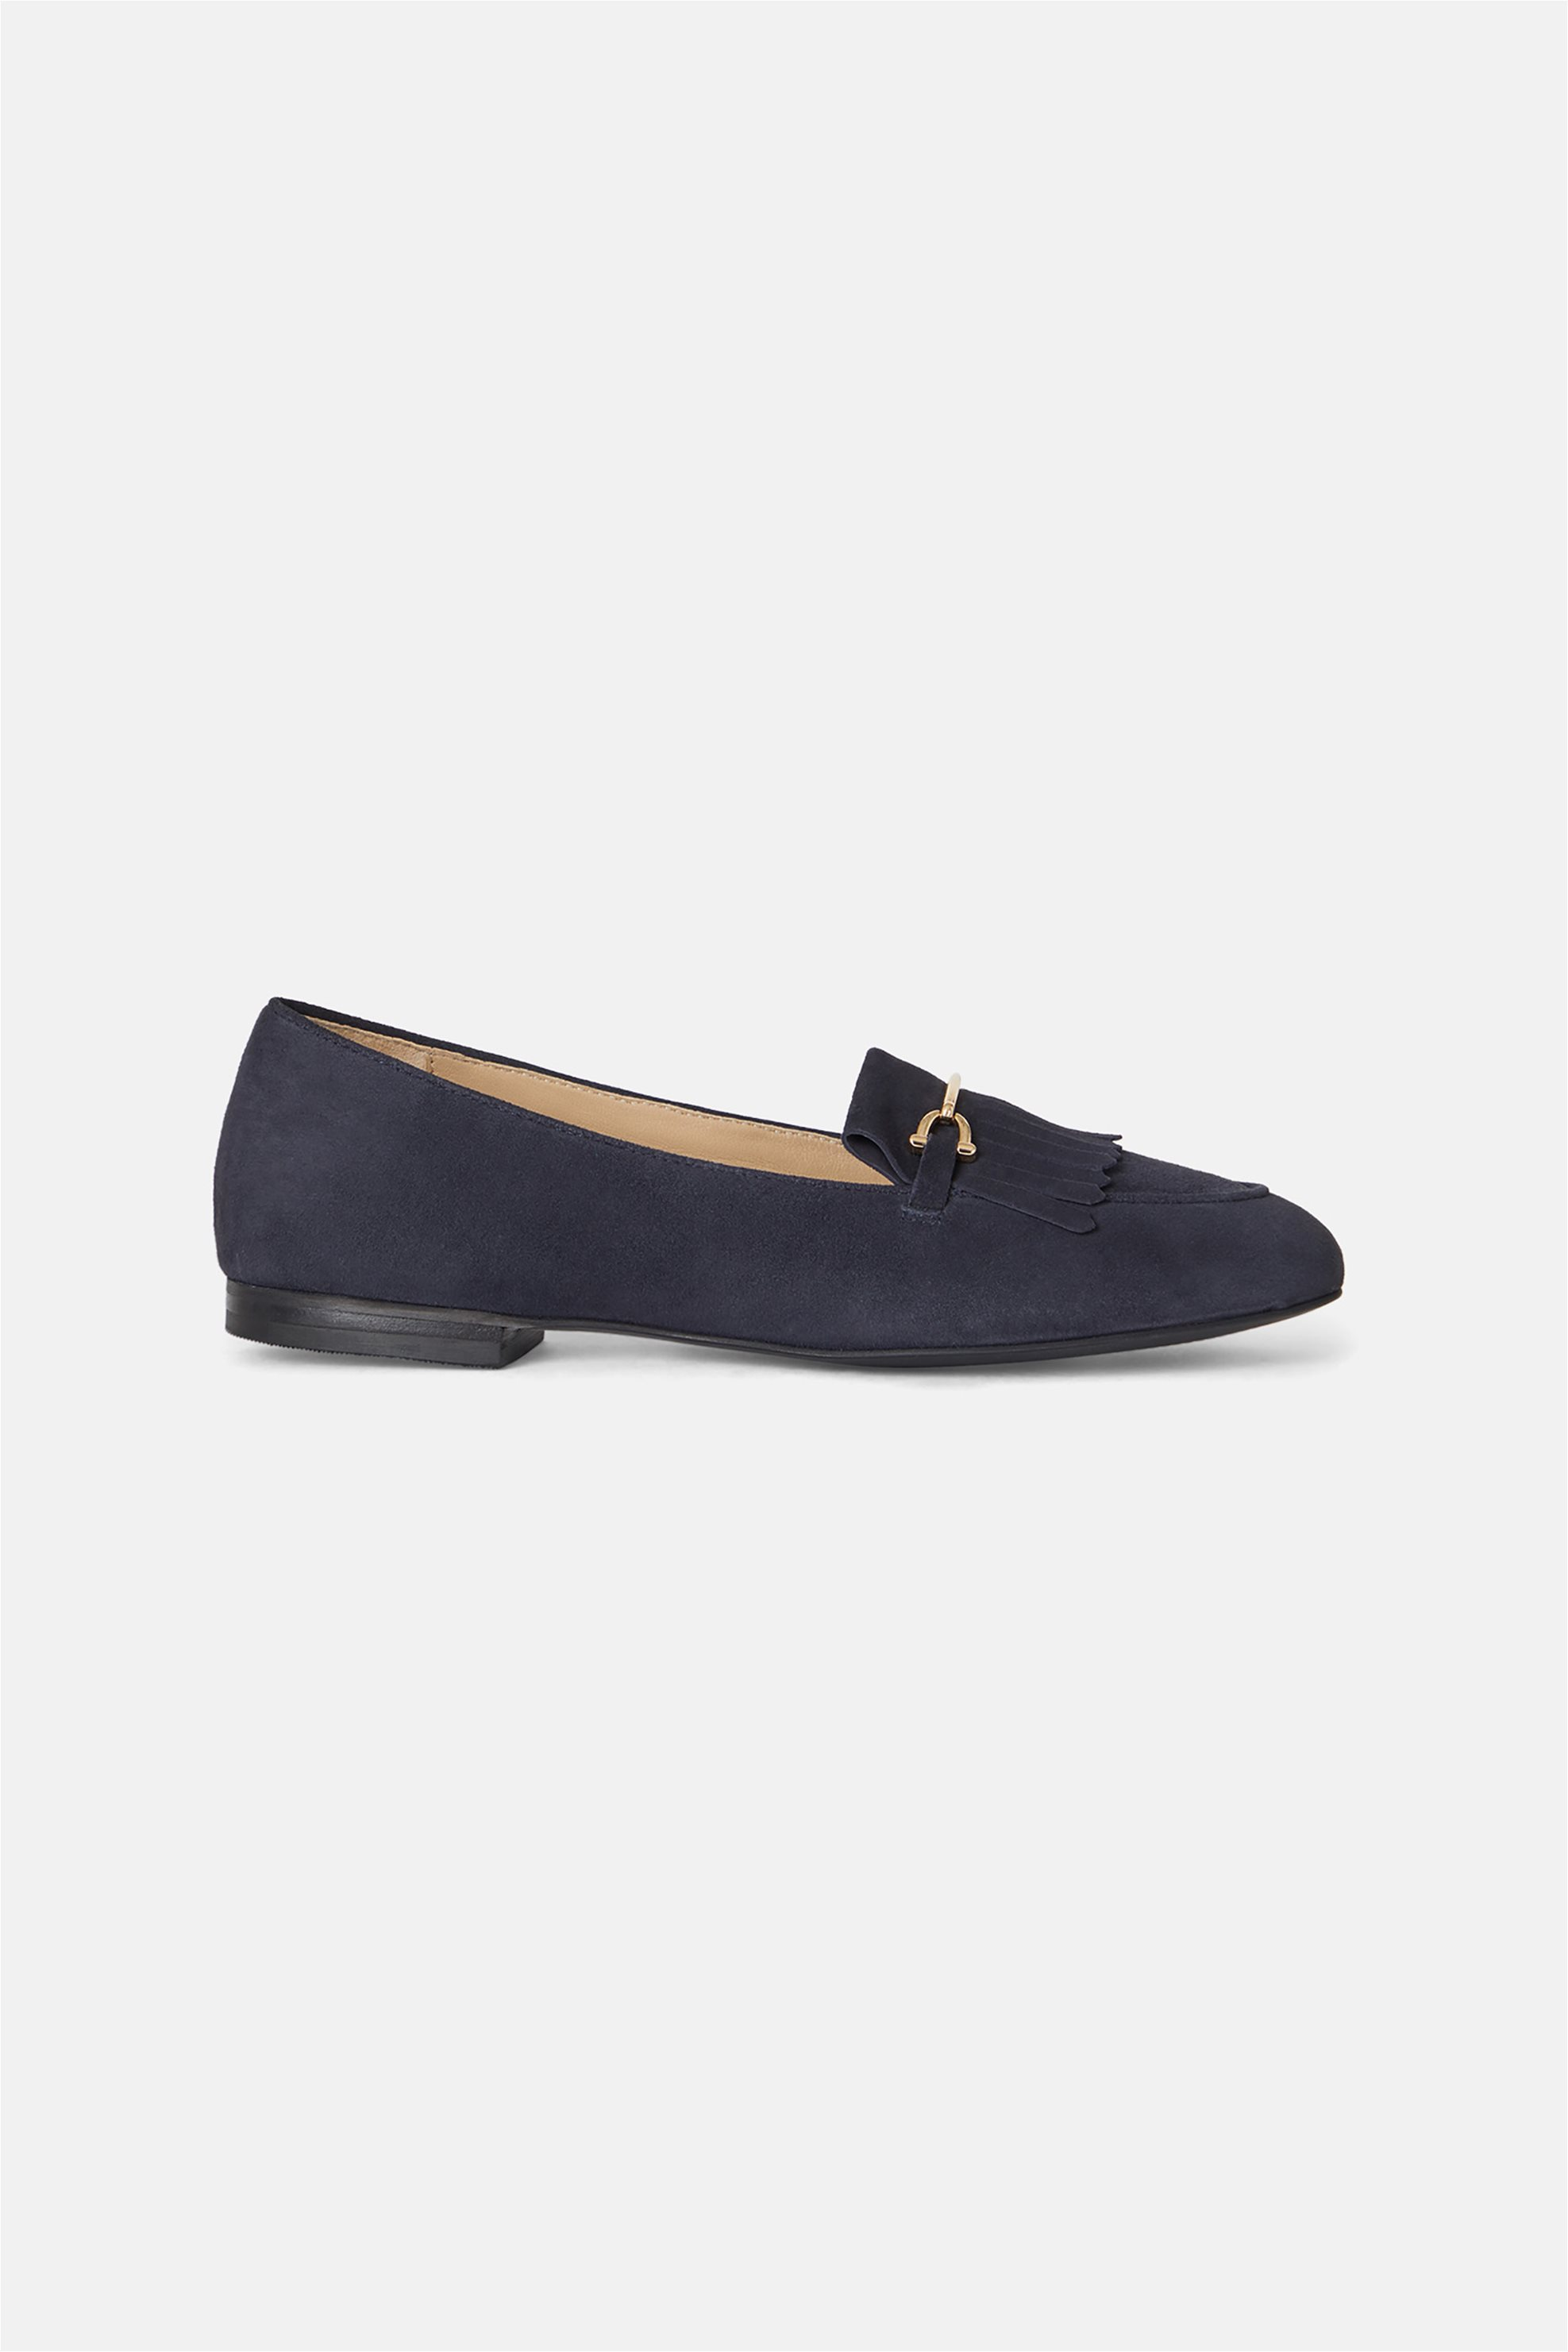 Minelli γυναικεία flat μοκασίνια «Lyanah» – 832309 – Μπλε Σκούρο